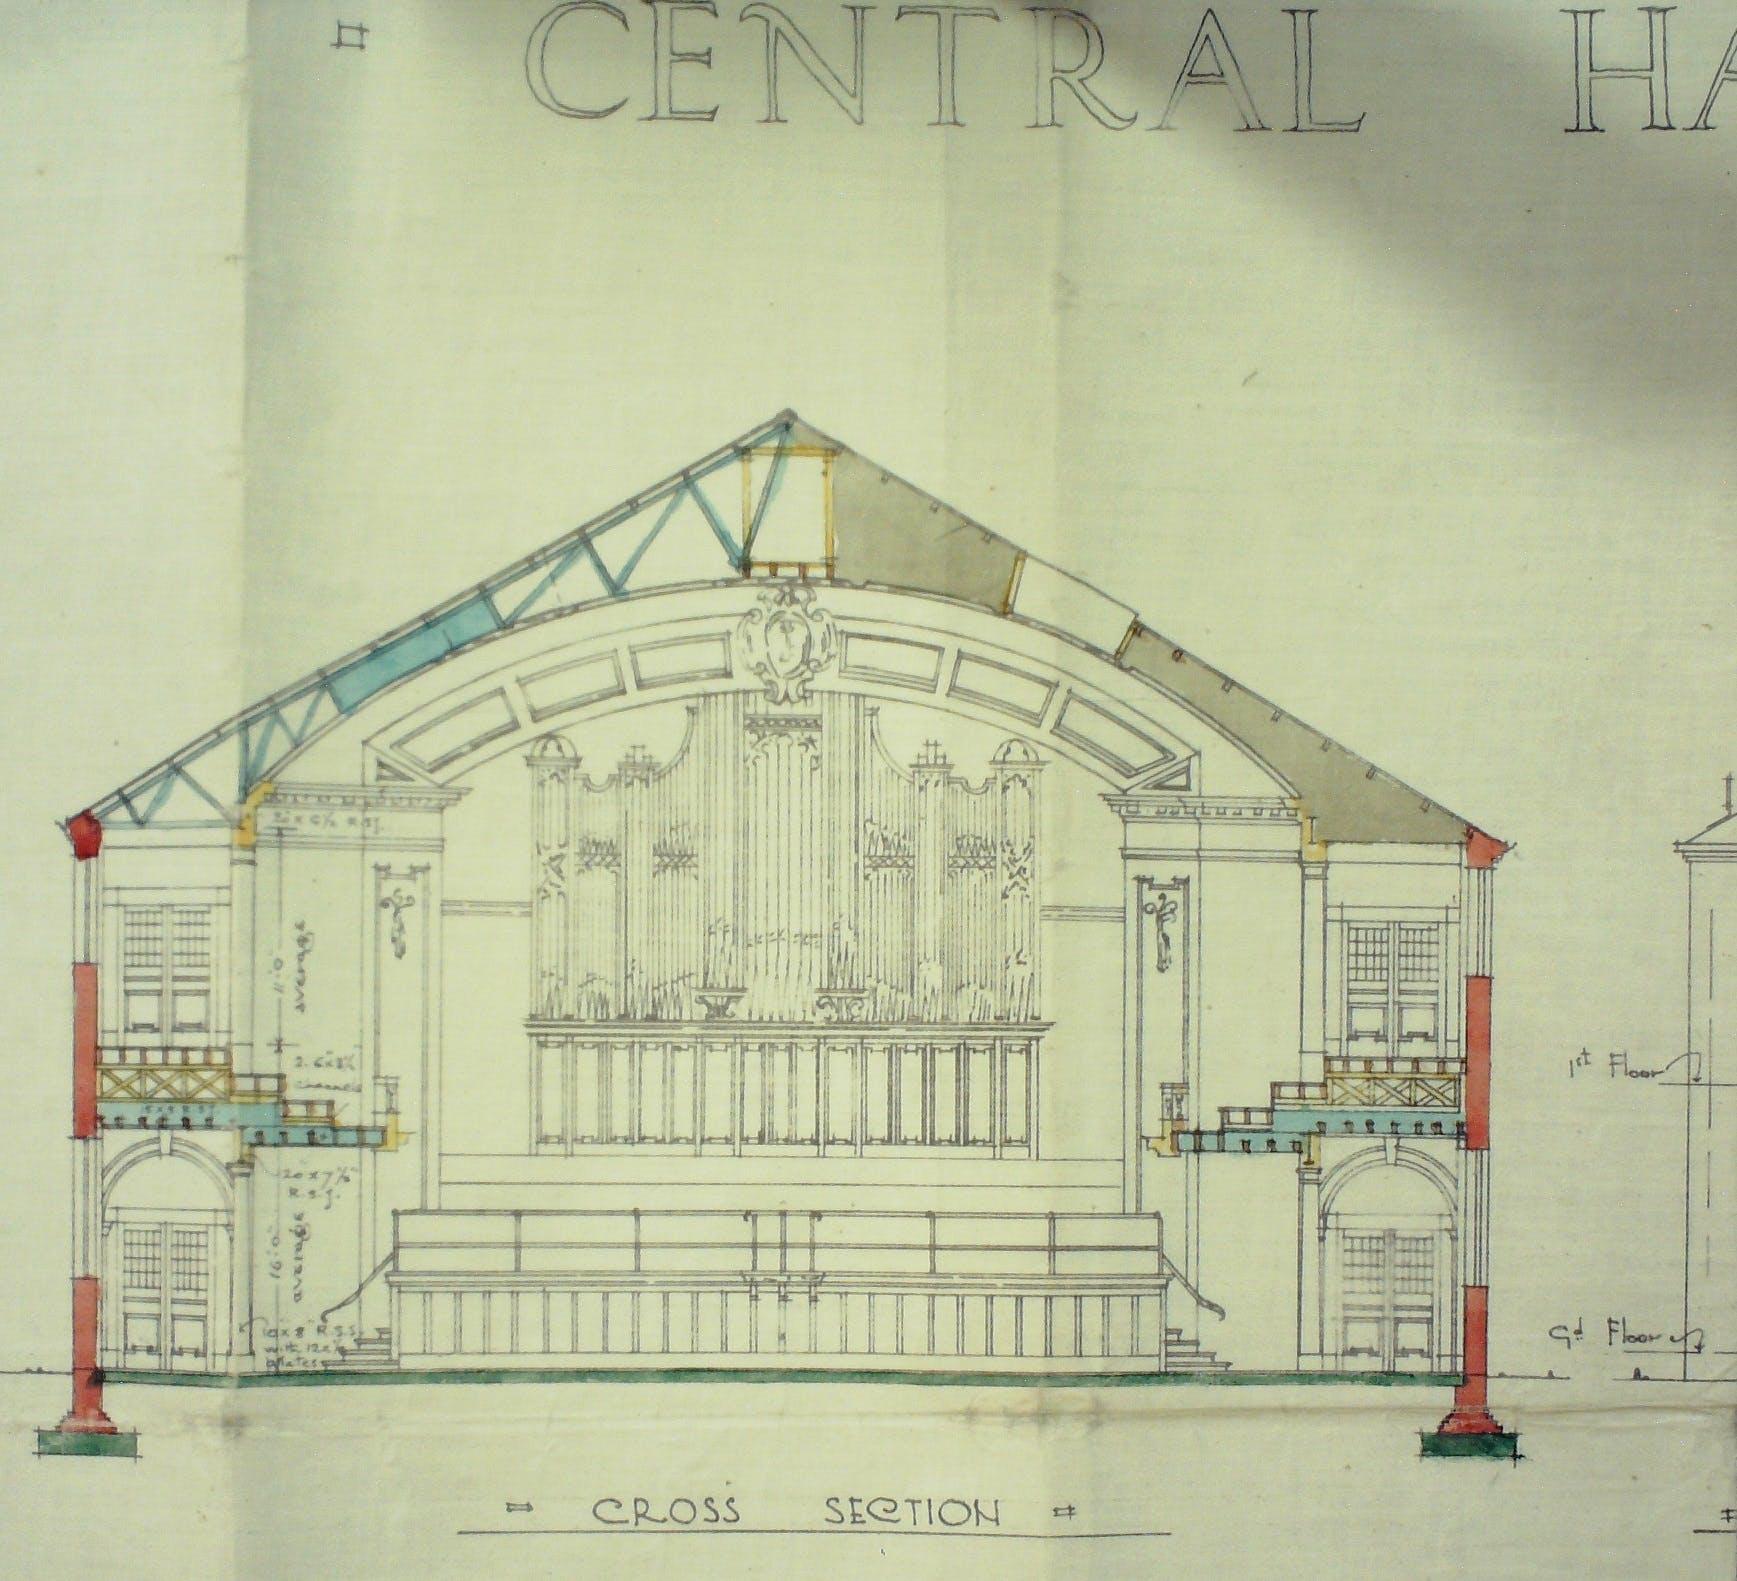 Central Hall plans 1925.jpg